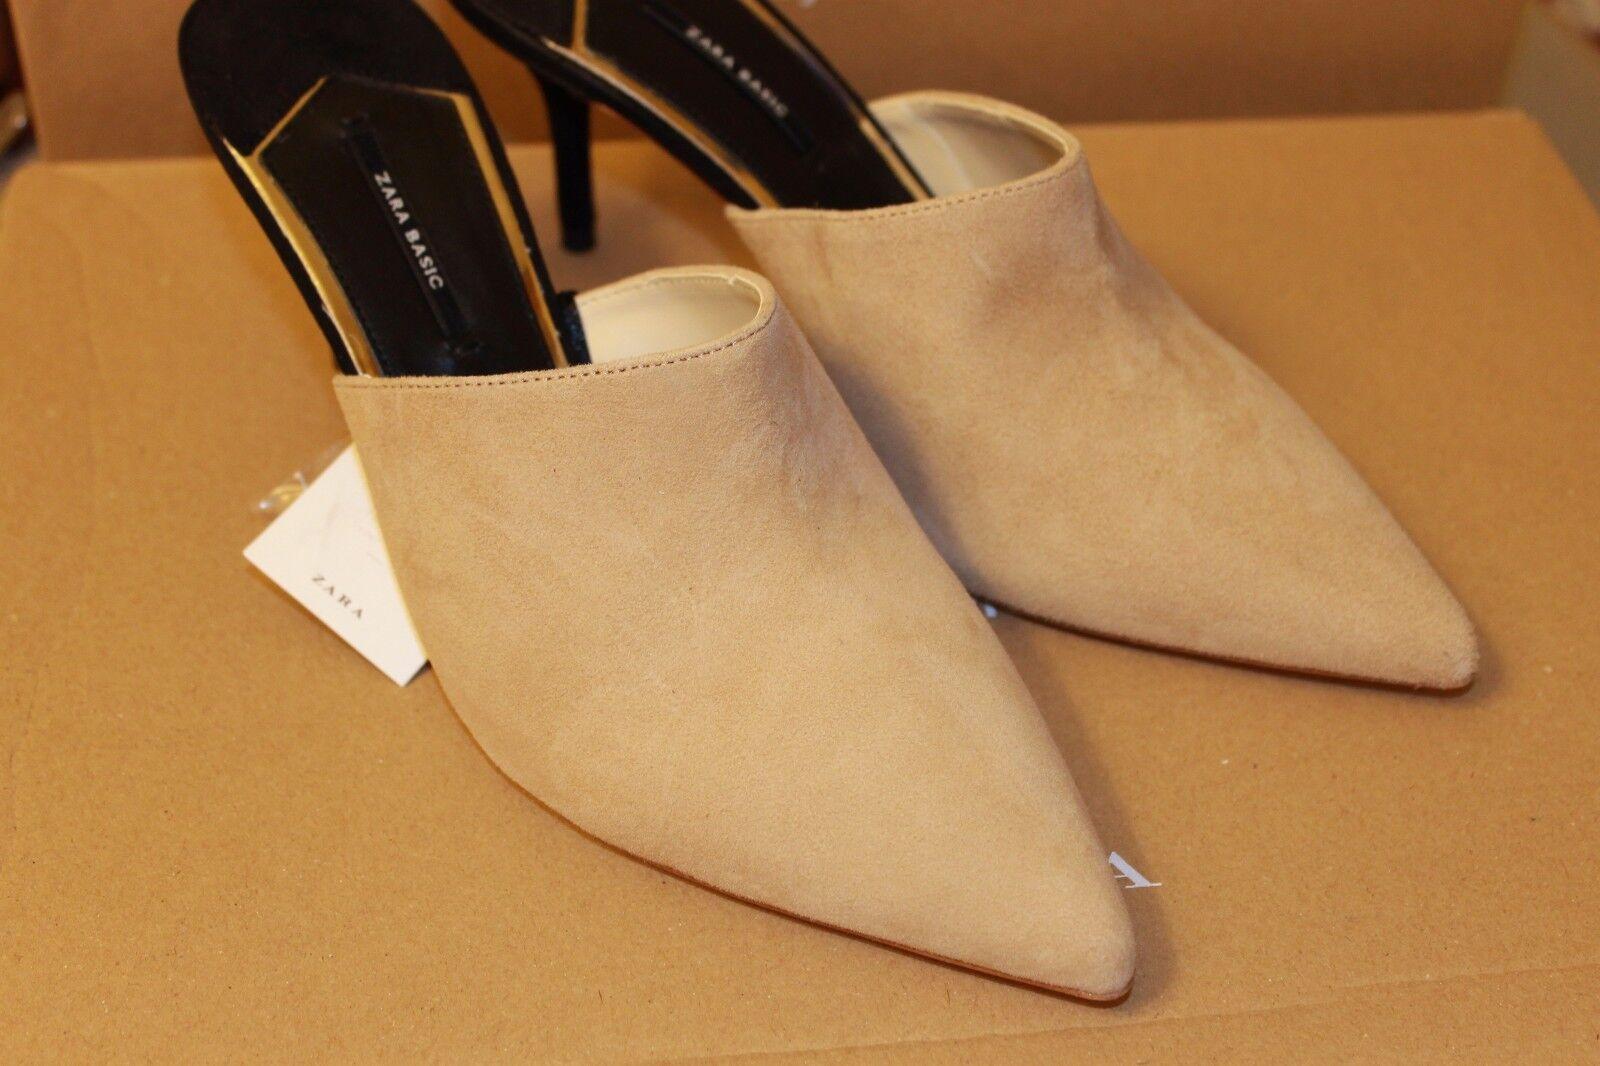 New Zara Leather Backless High Heel Heel Heel shoes Size 6.5, 8  Second item ships free 881b7e